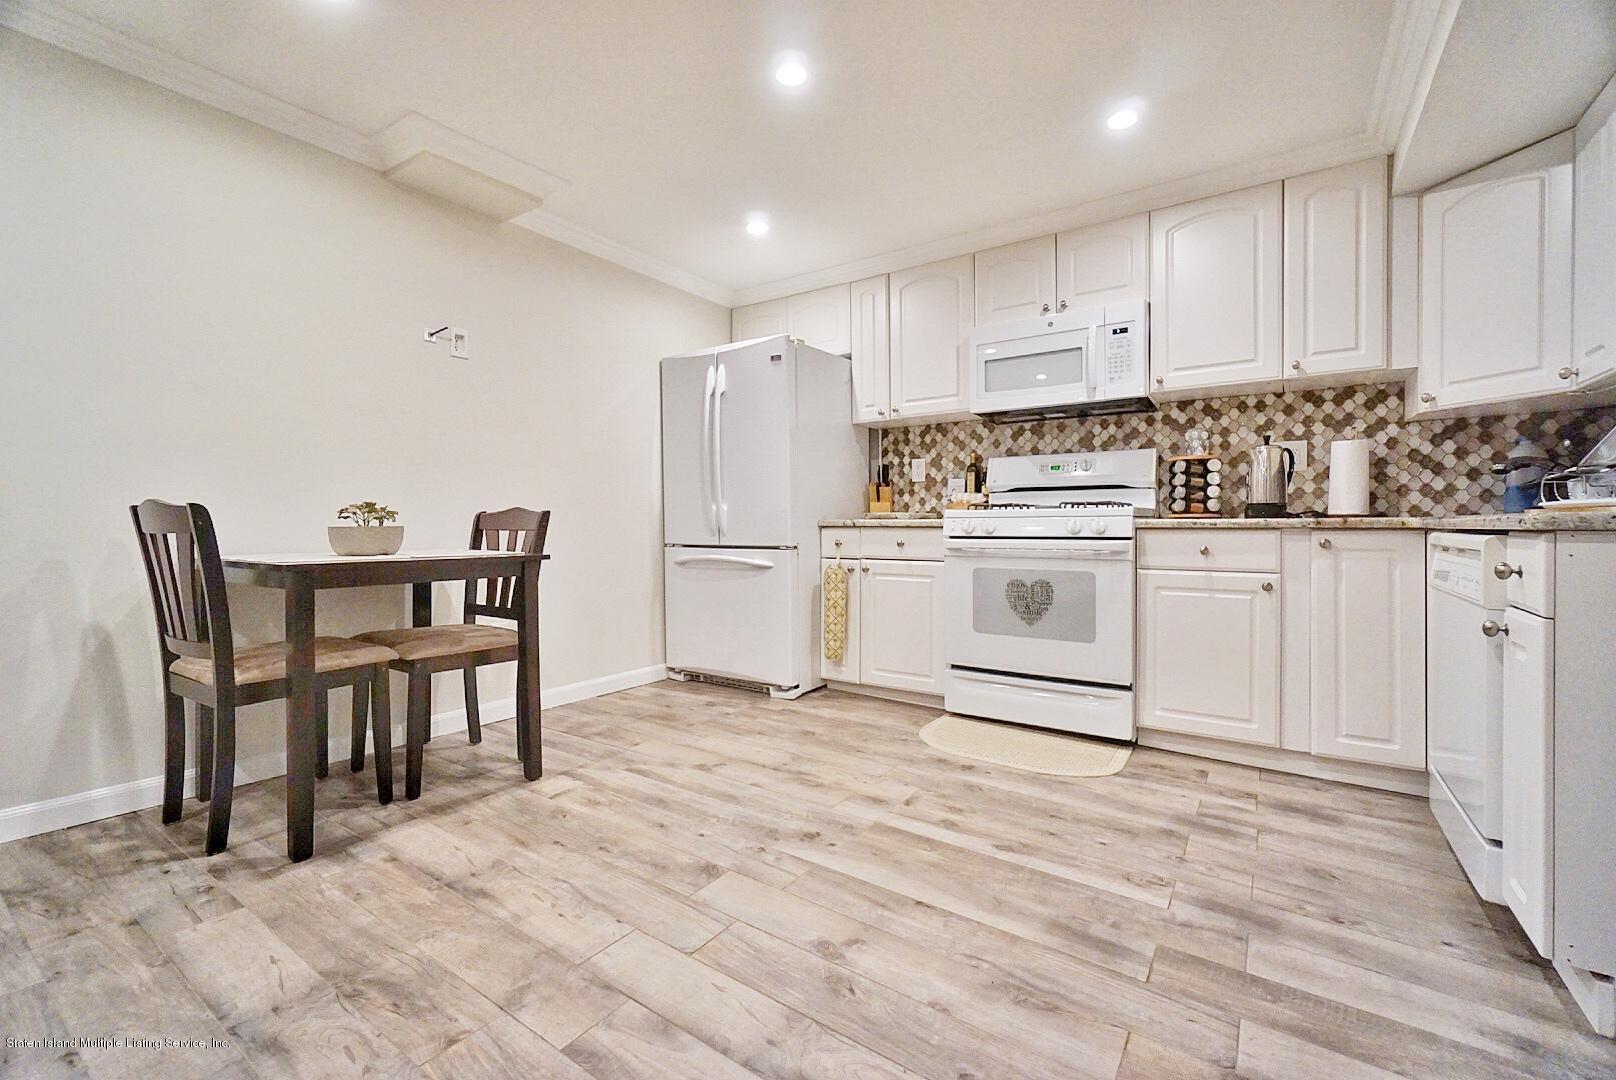 Single Family - Detached 67 Marvin Road  Staten Island, NY 10309, MLS-1128691-27